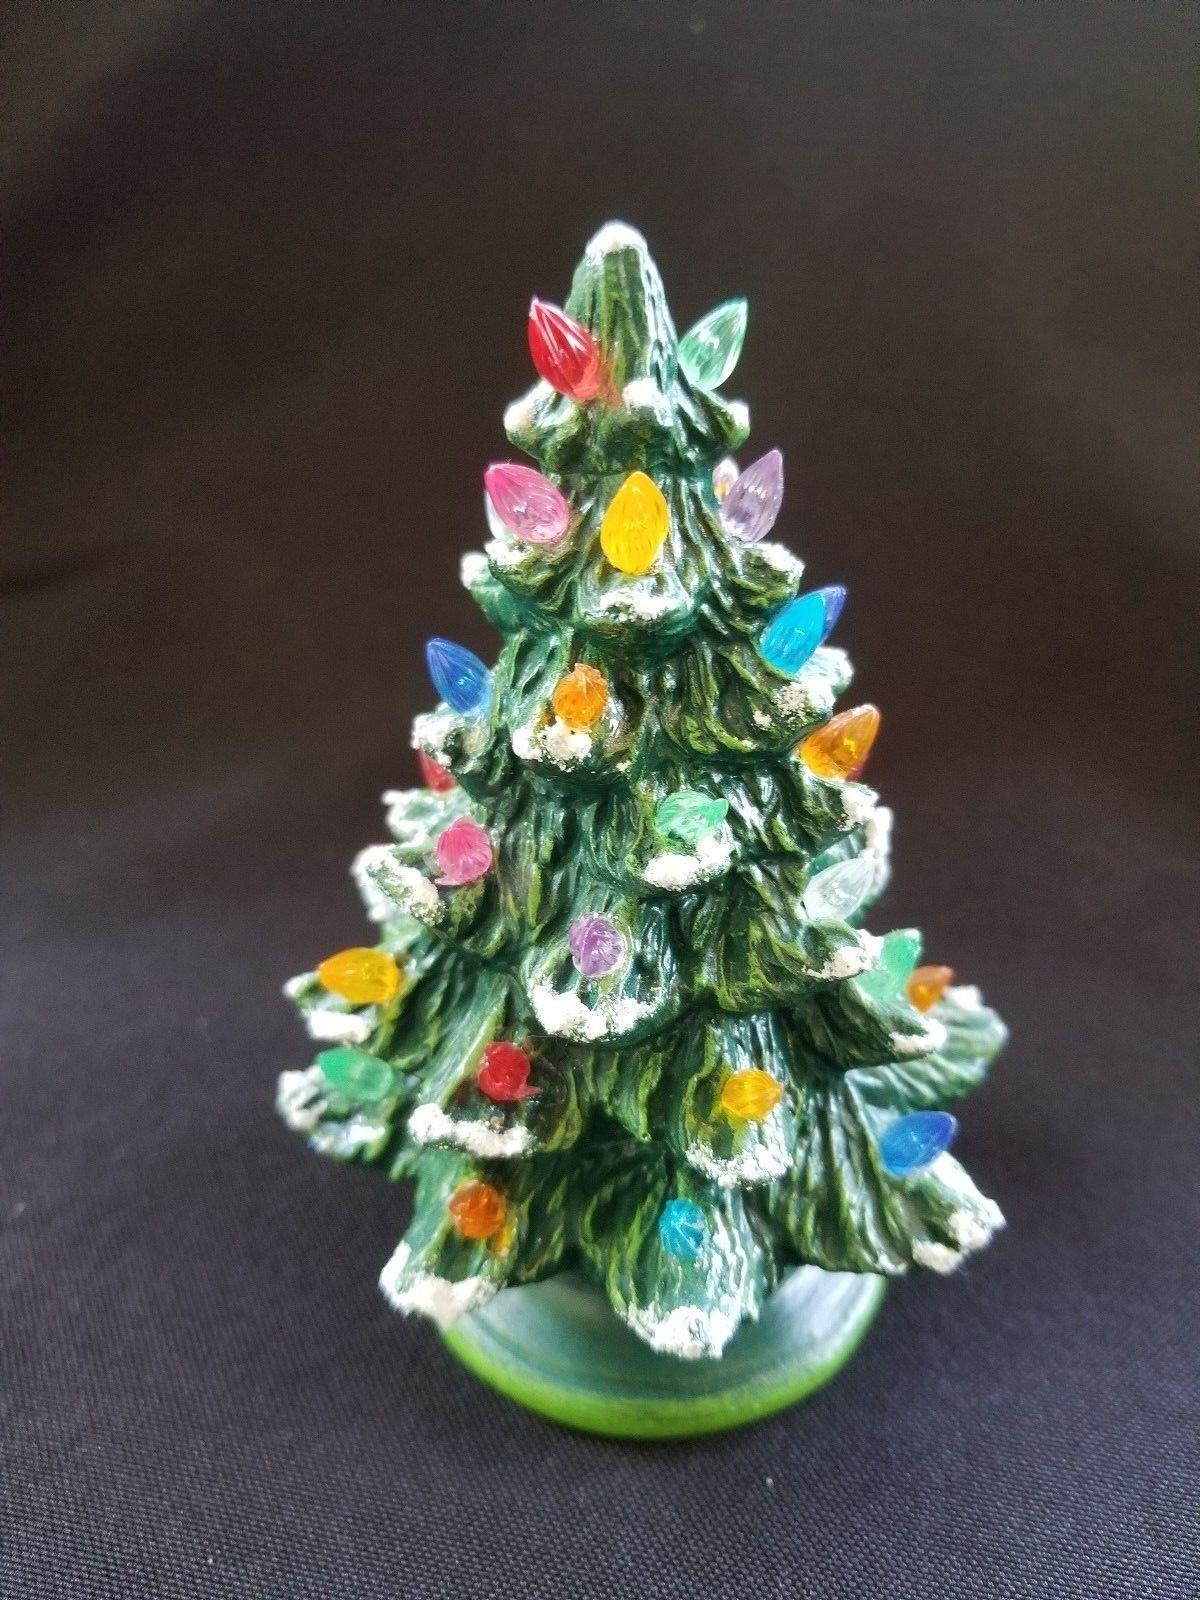 4 5 Mini Plastic Christmas Tree With Bulbs